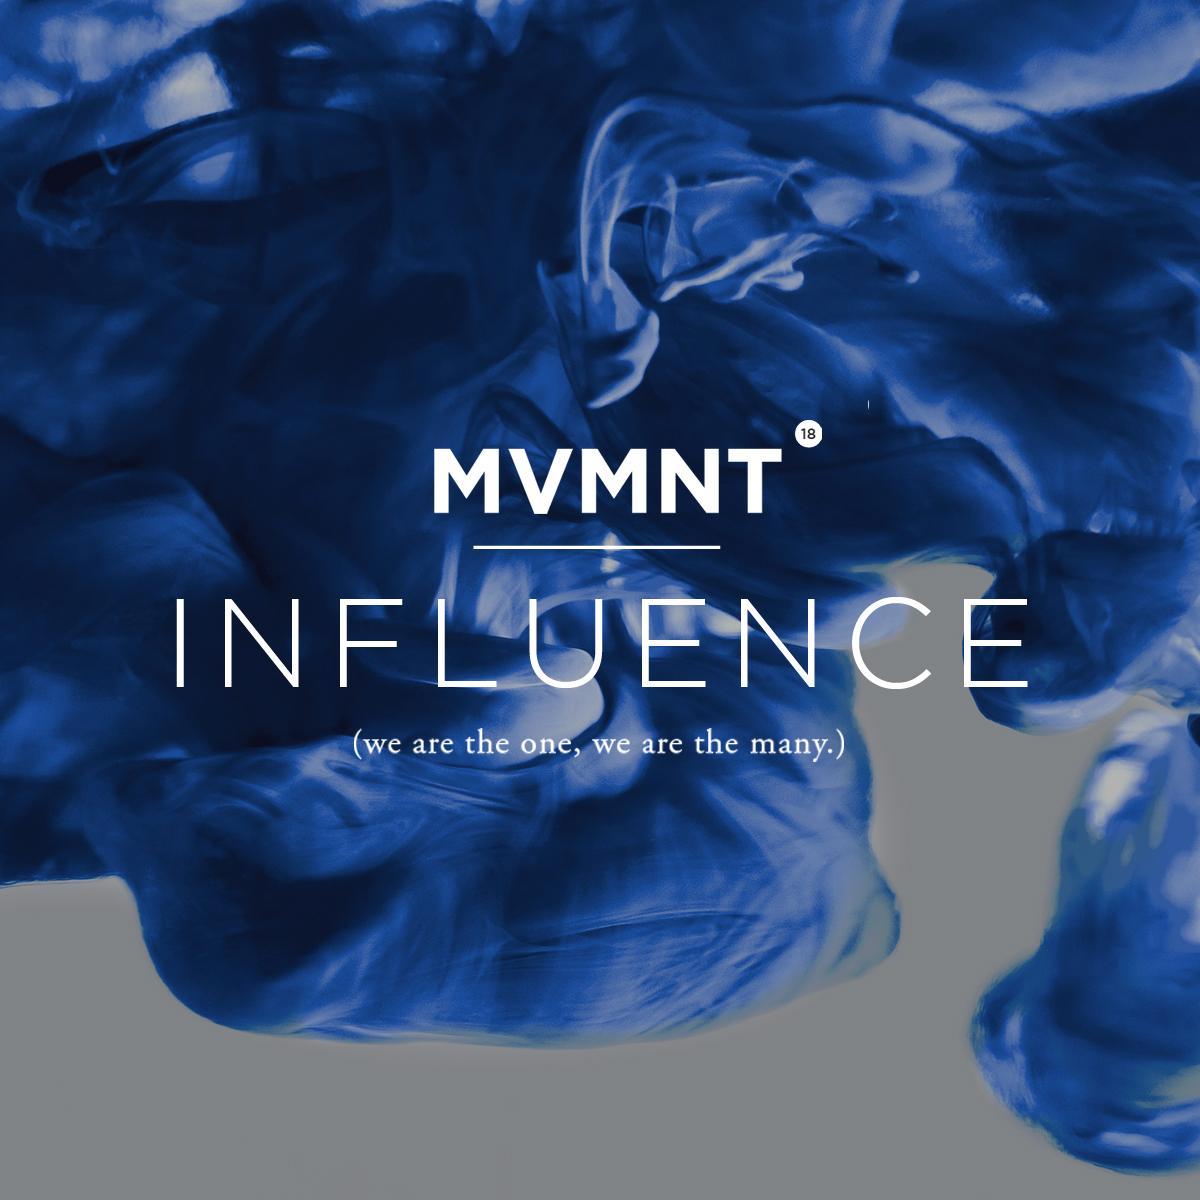 influence_SM 1.jpg